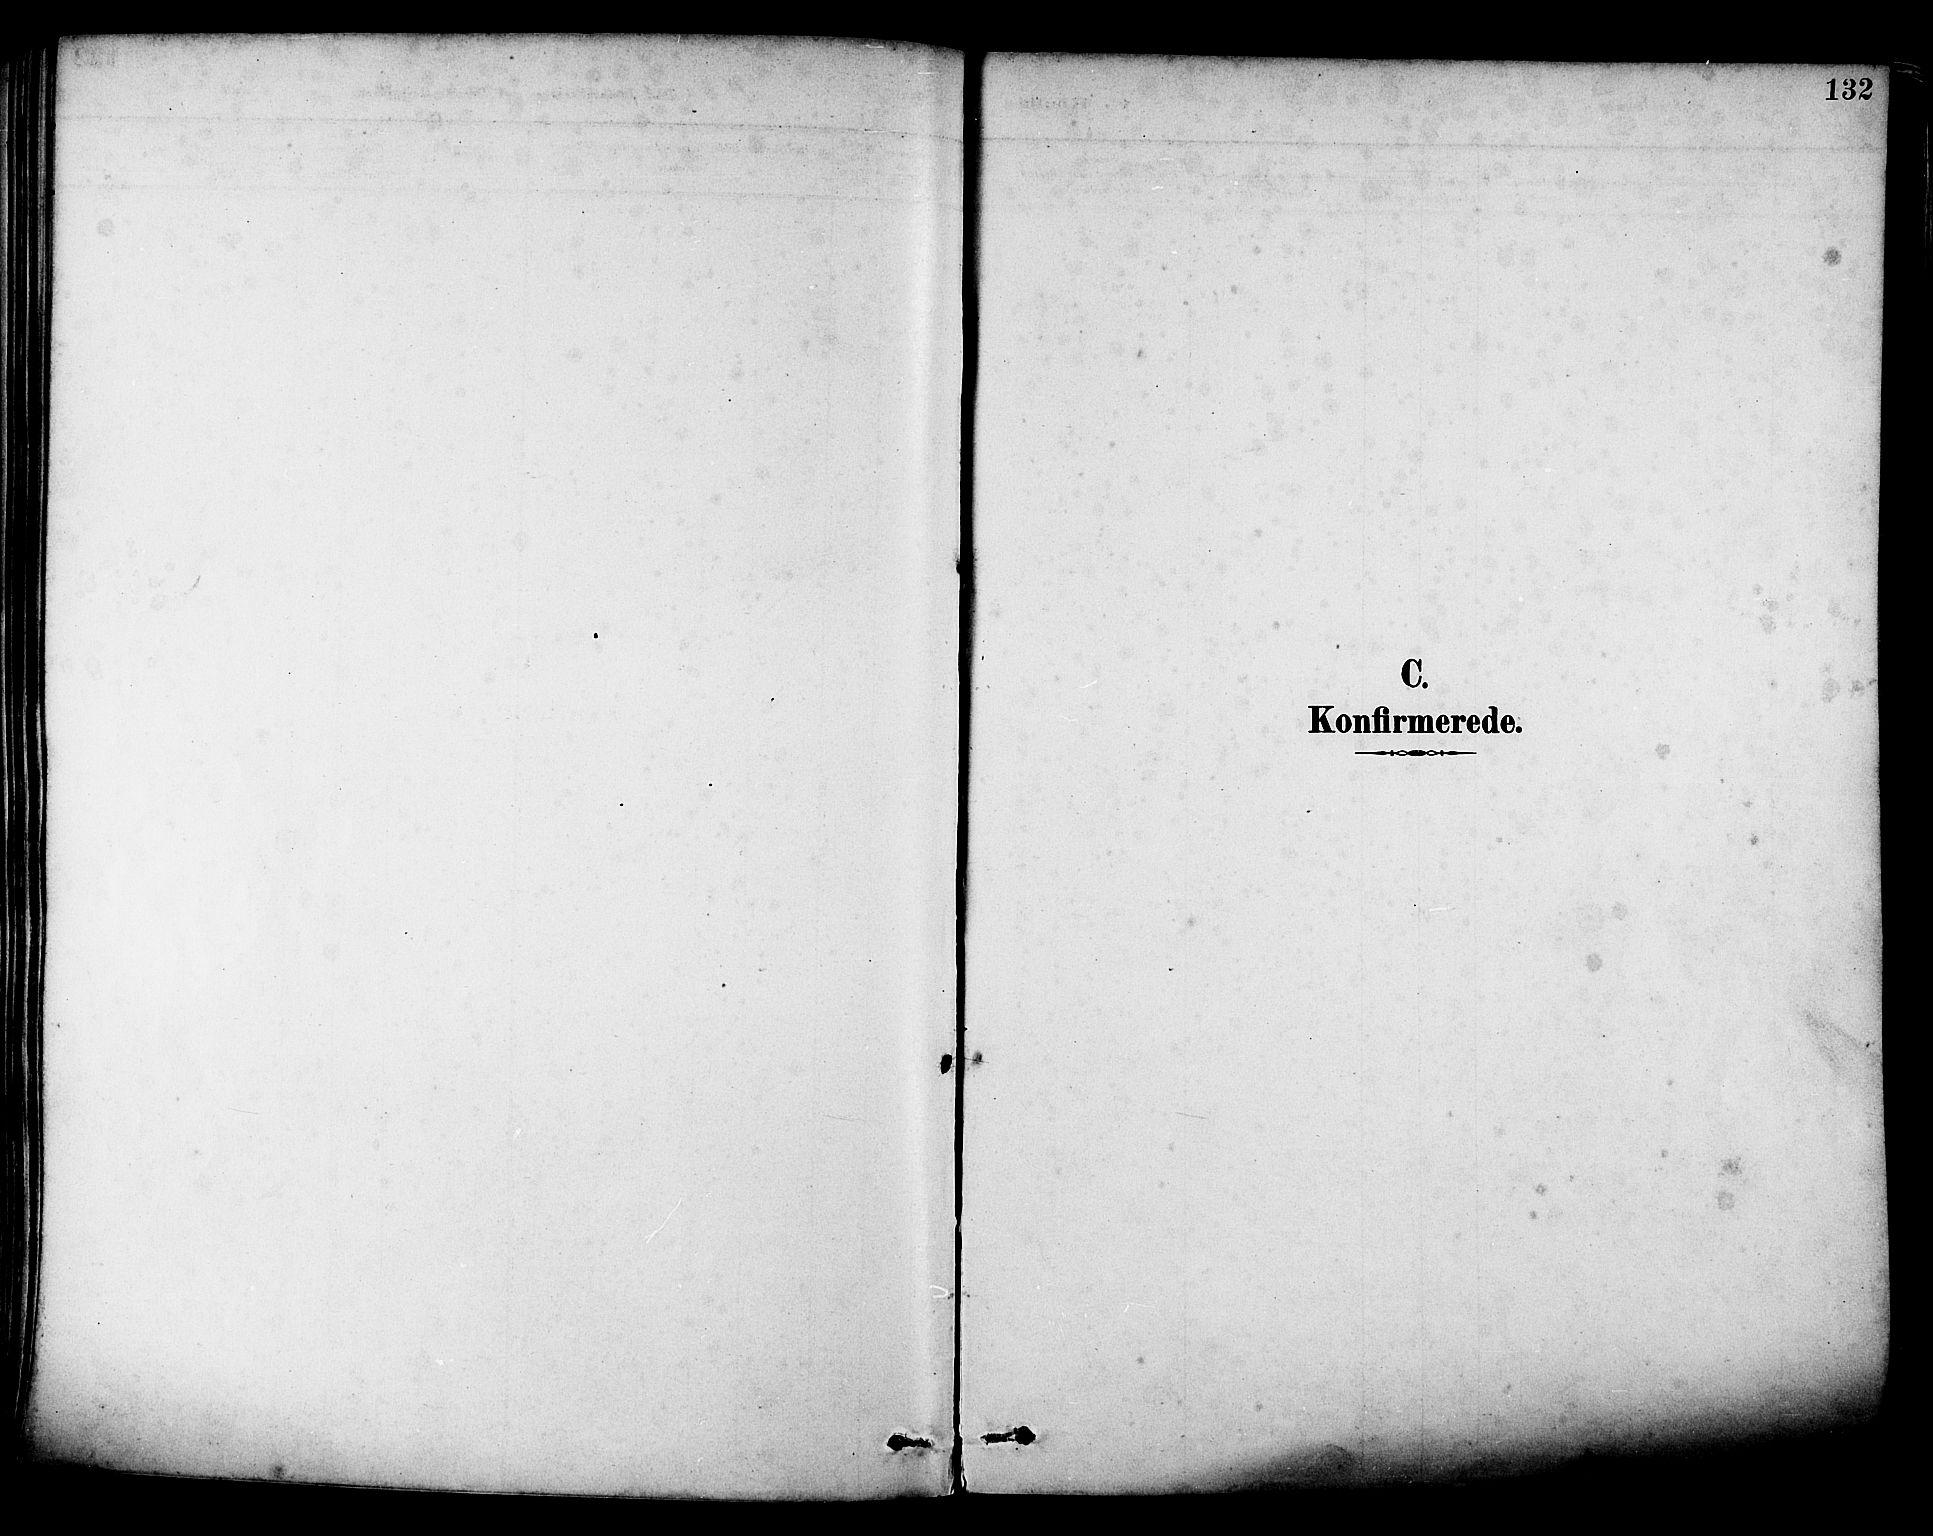 SAT, Ministerialprotokoller, klokkerbøker og fødselsregistre - Nordland, 880/L1133: Ministerialbok nr. 880A07, 1888-1898, s. 132